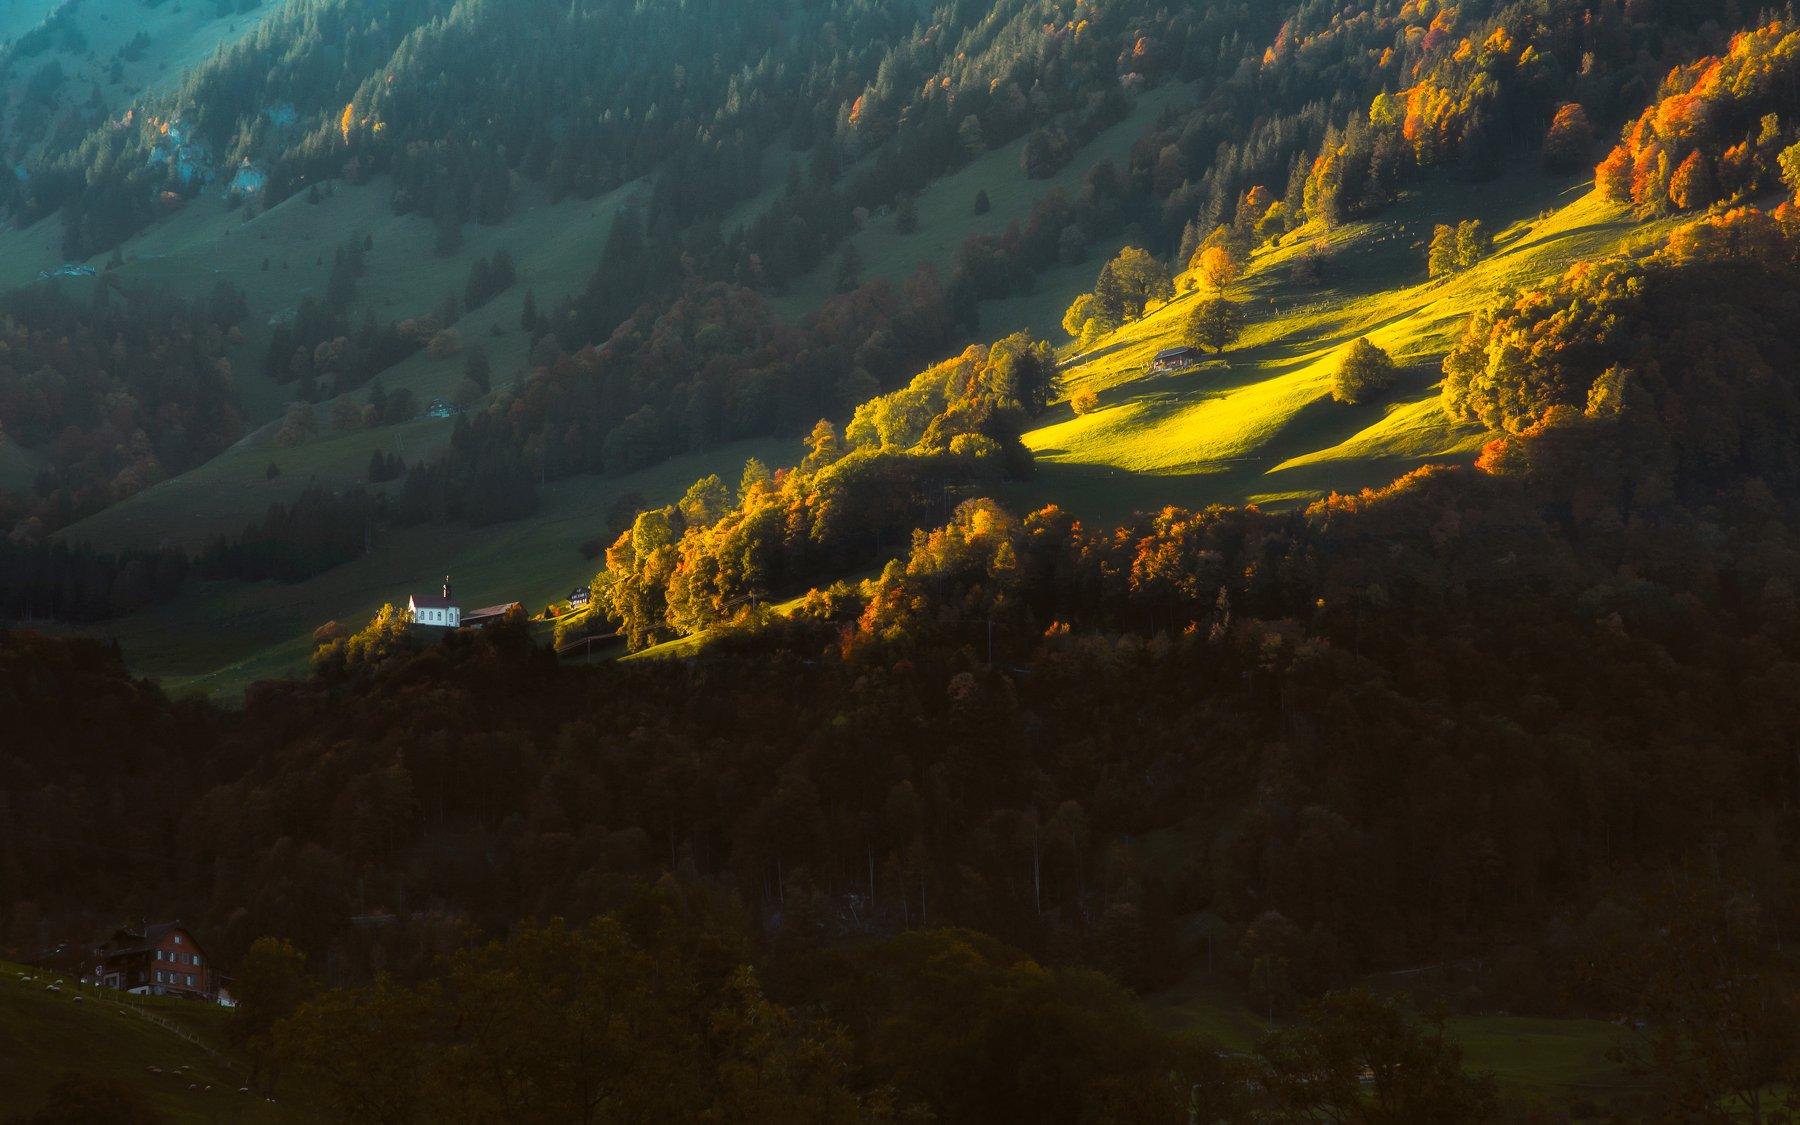 landscape,church,Церкав,sunlight,свет,пейзаж,swiss,autumn, Olegs Bucis